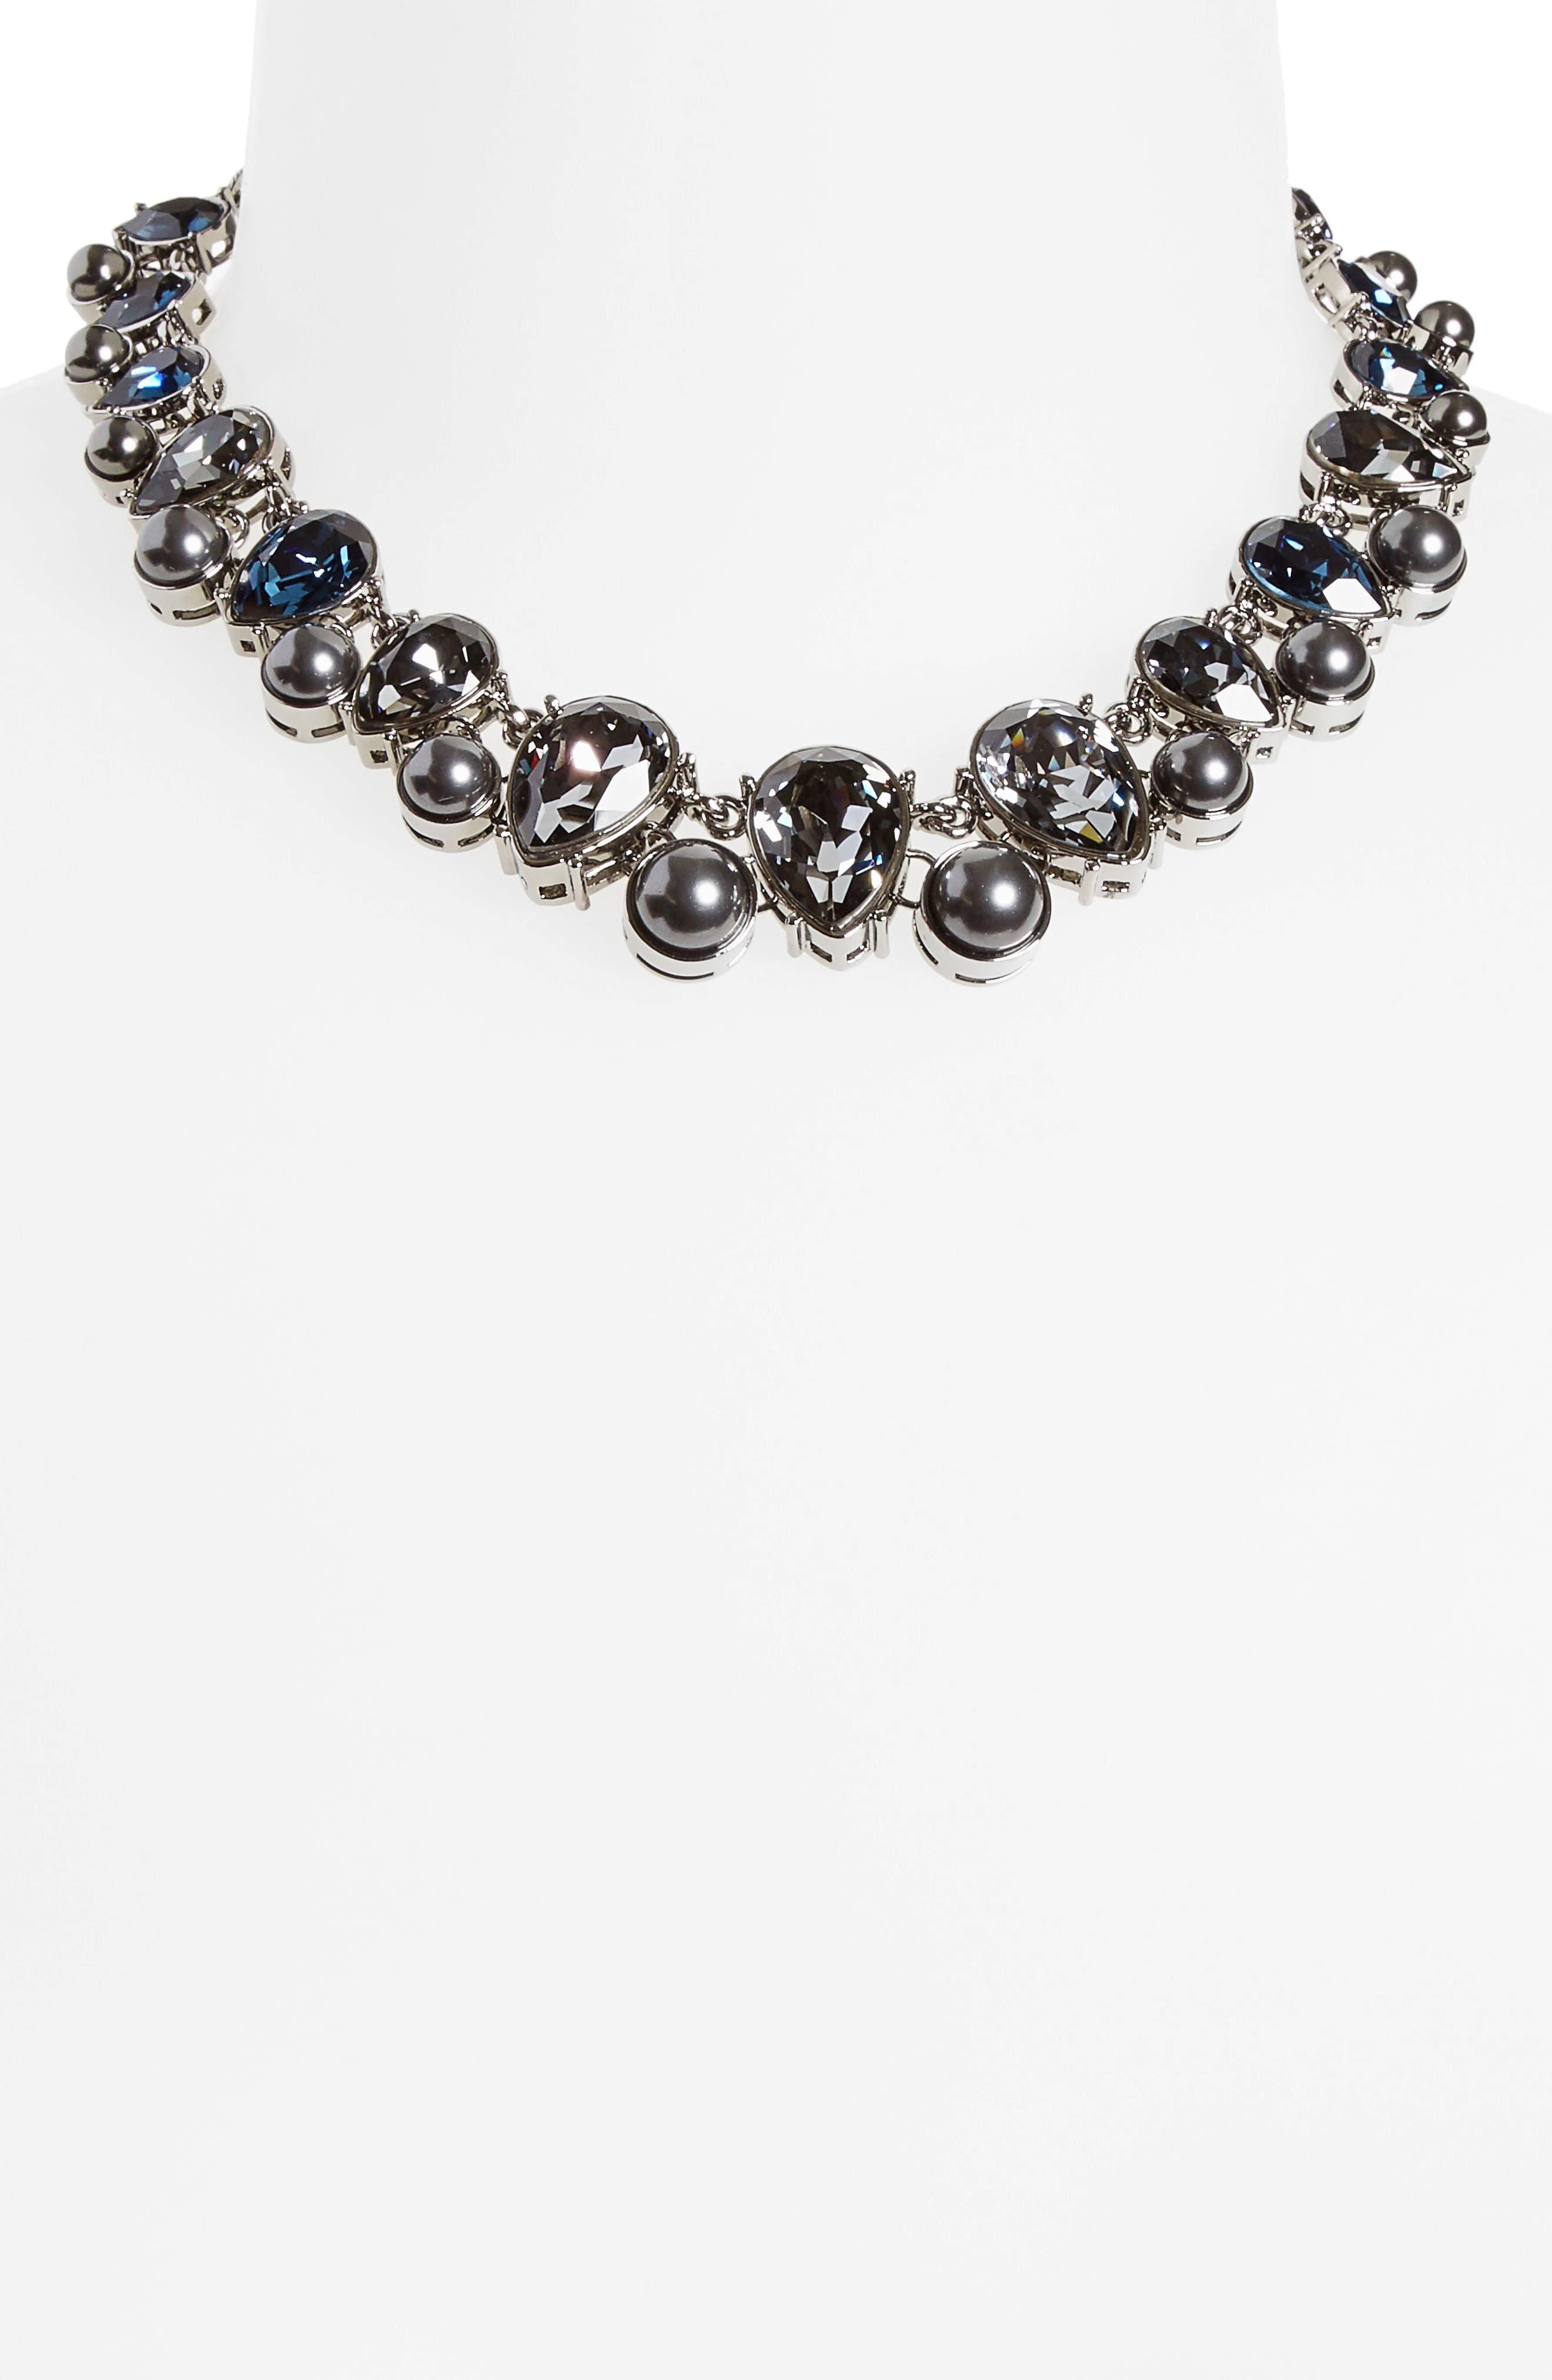 Swarovski Crystal & Imitation Pearl Necklace,                             Alternate thumbnail 2, color,                             040